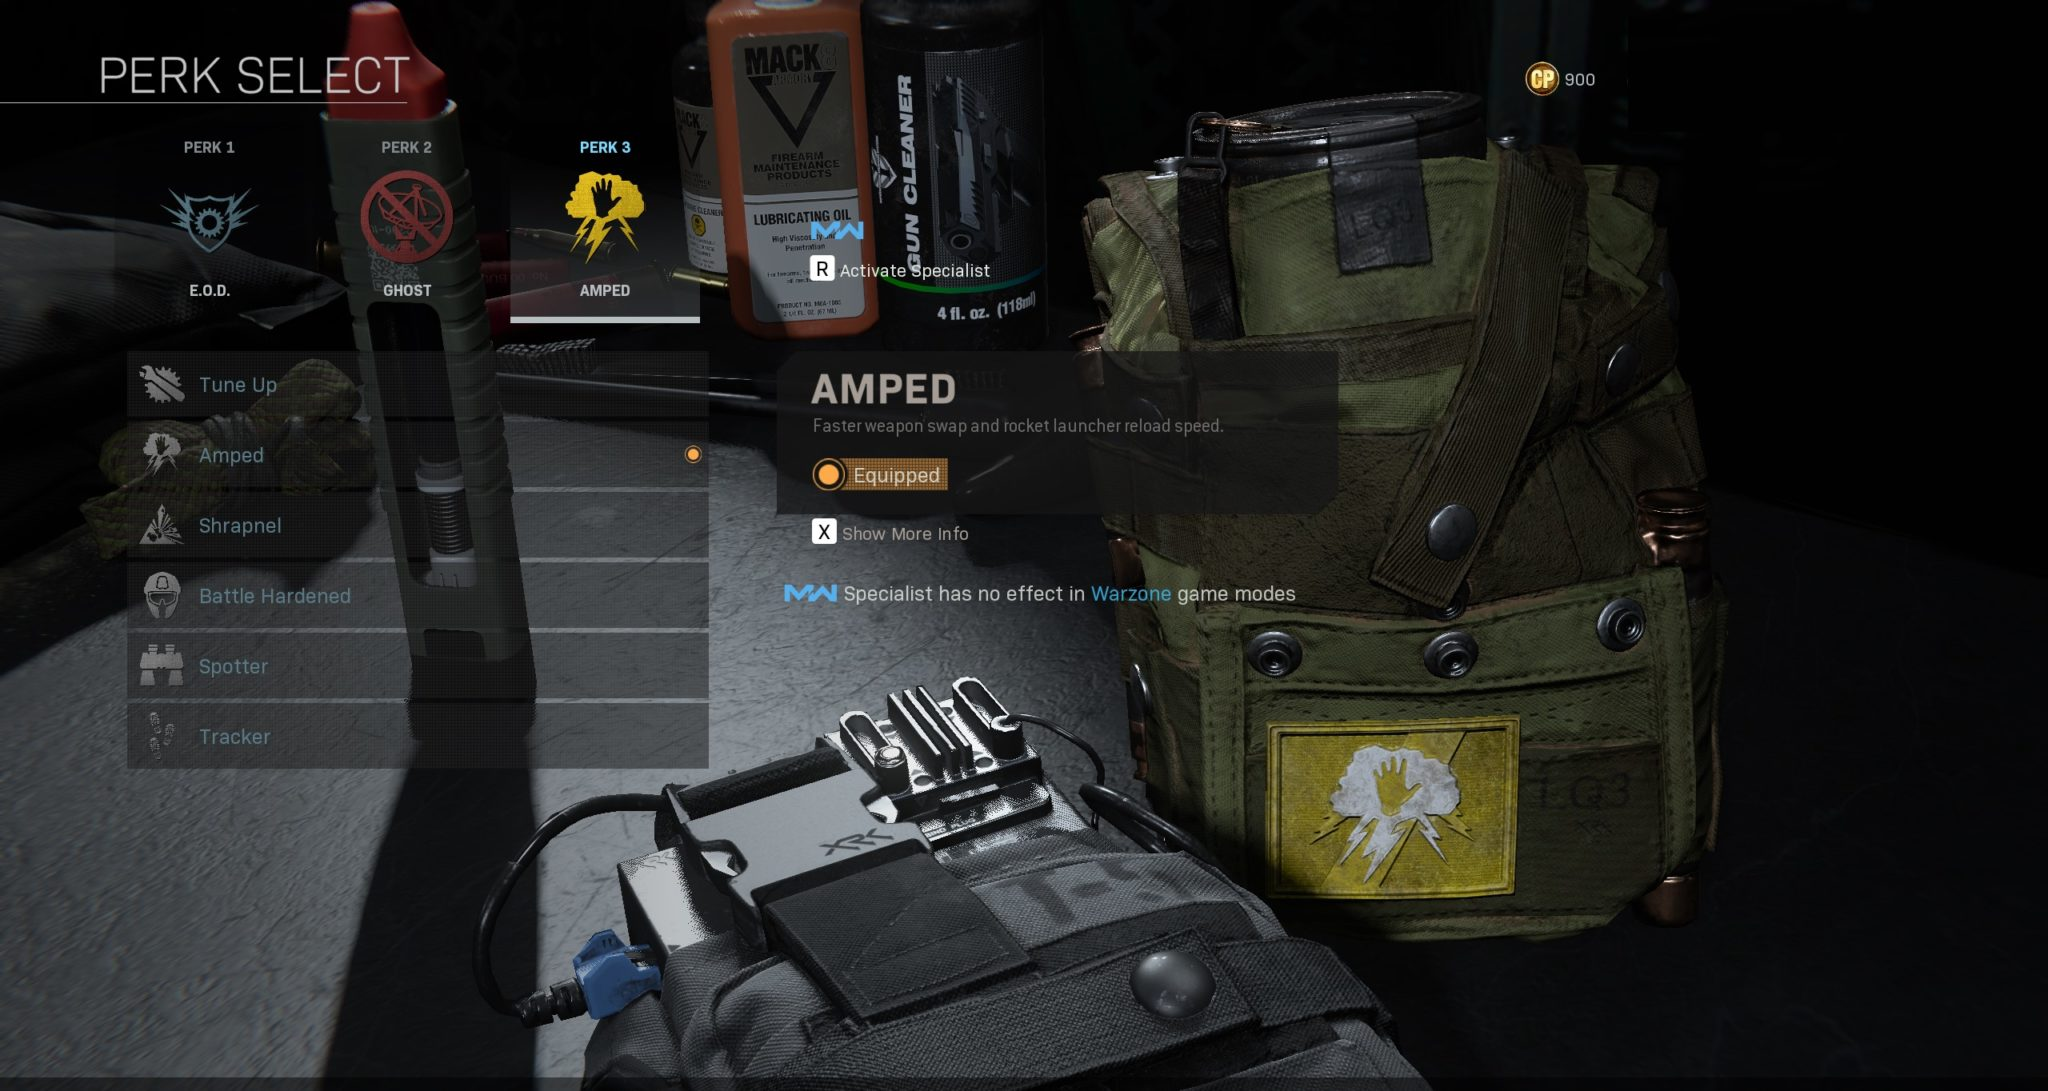 Amped perk